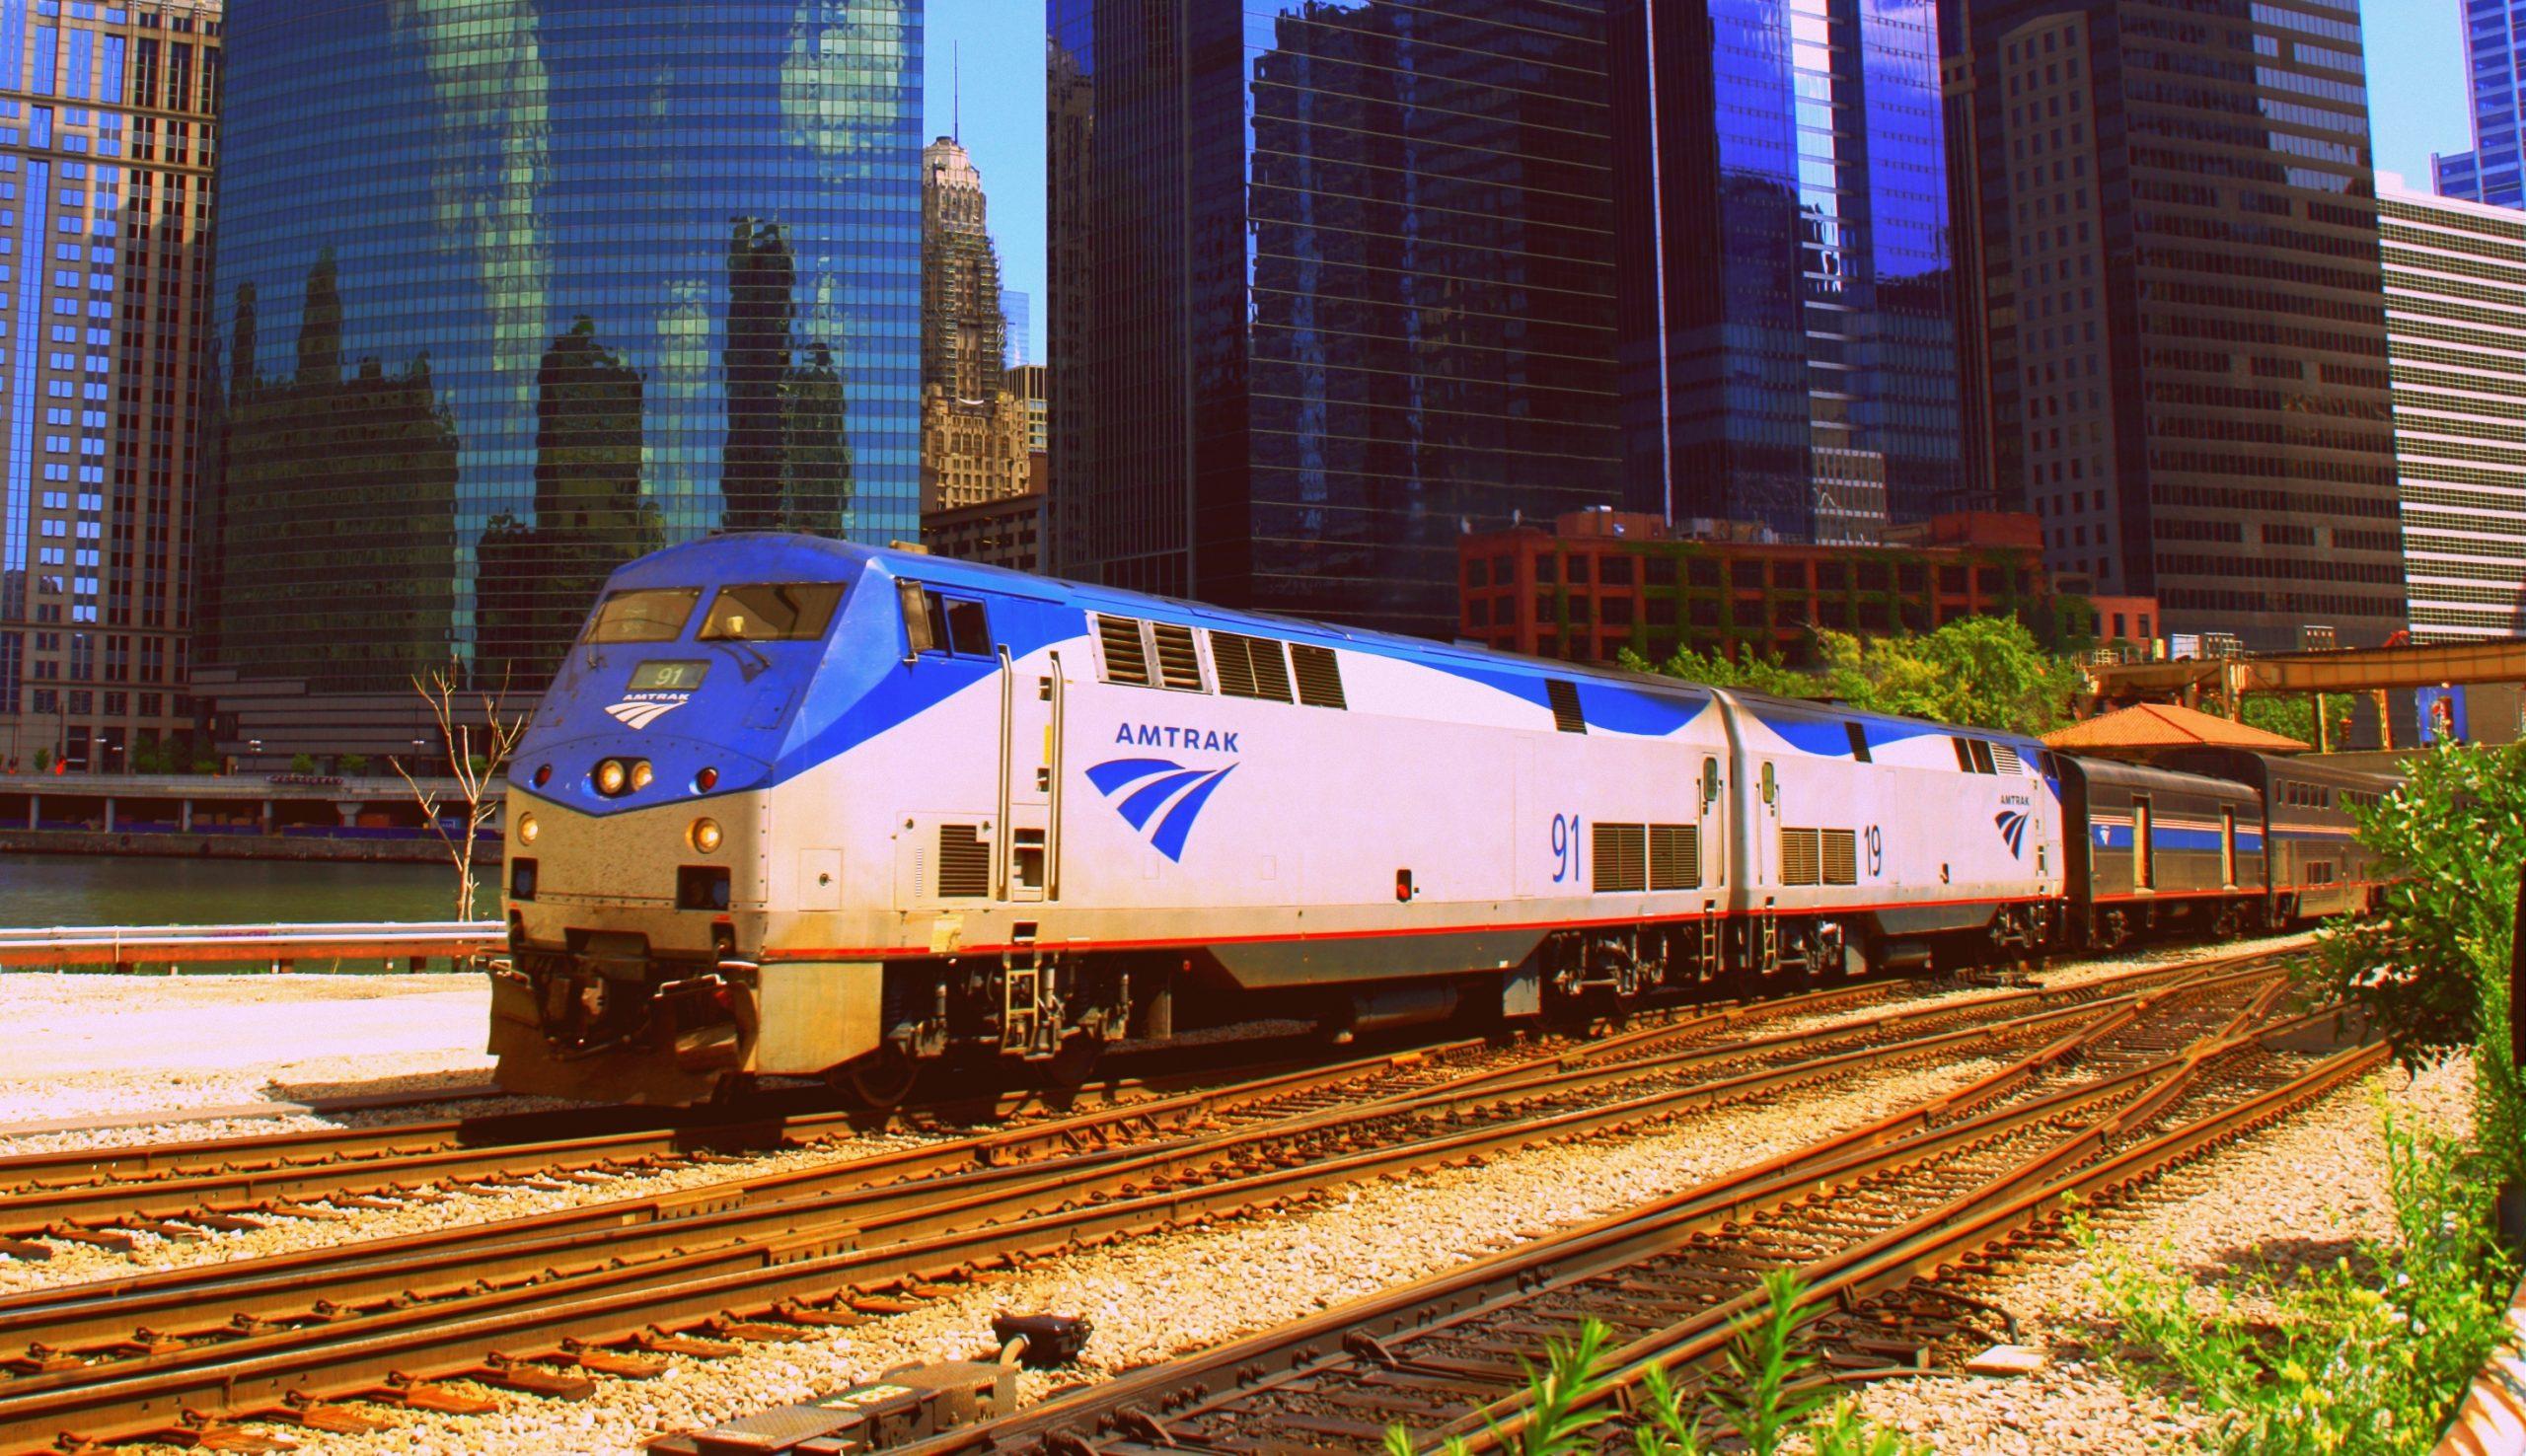 Across America by Amtrak Train